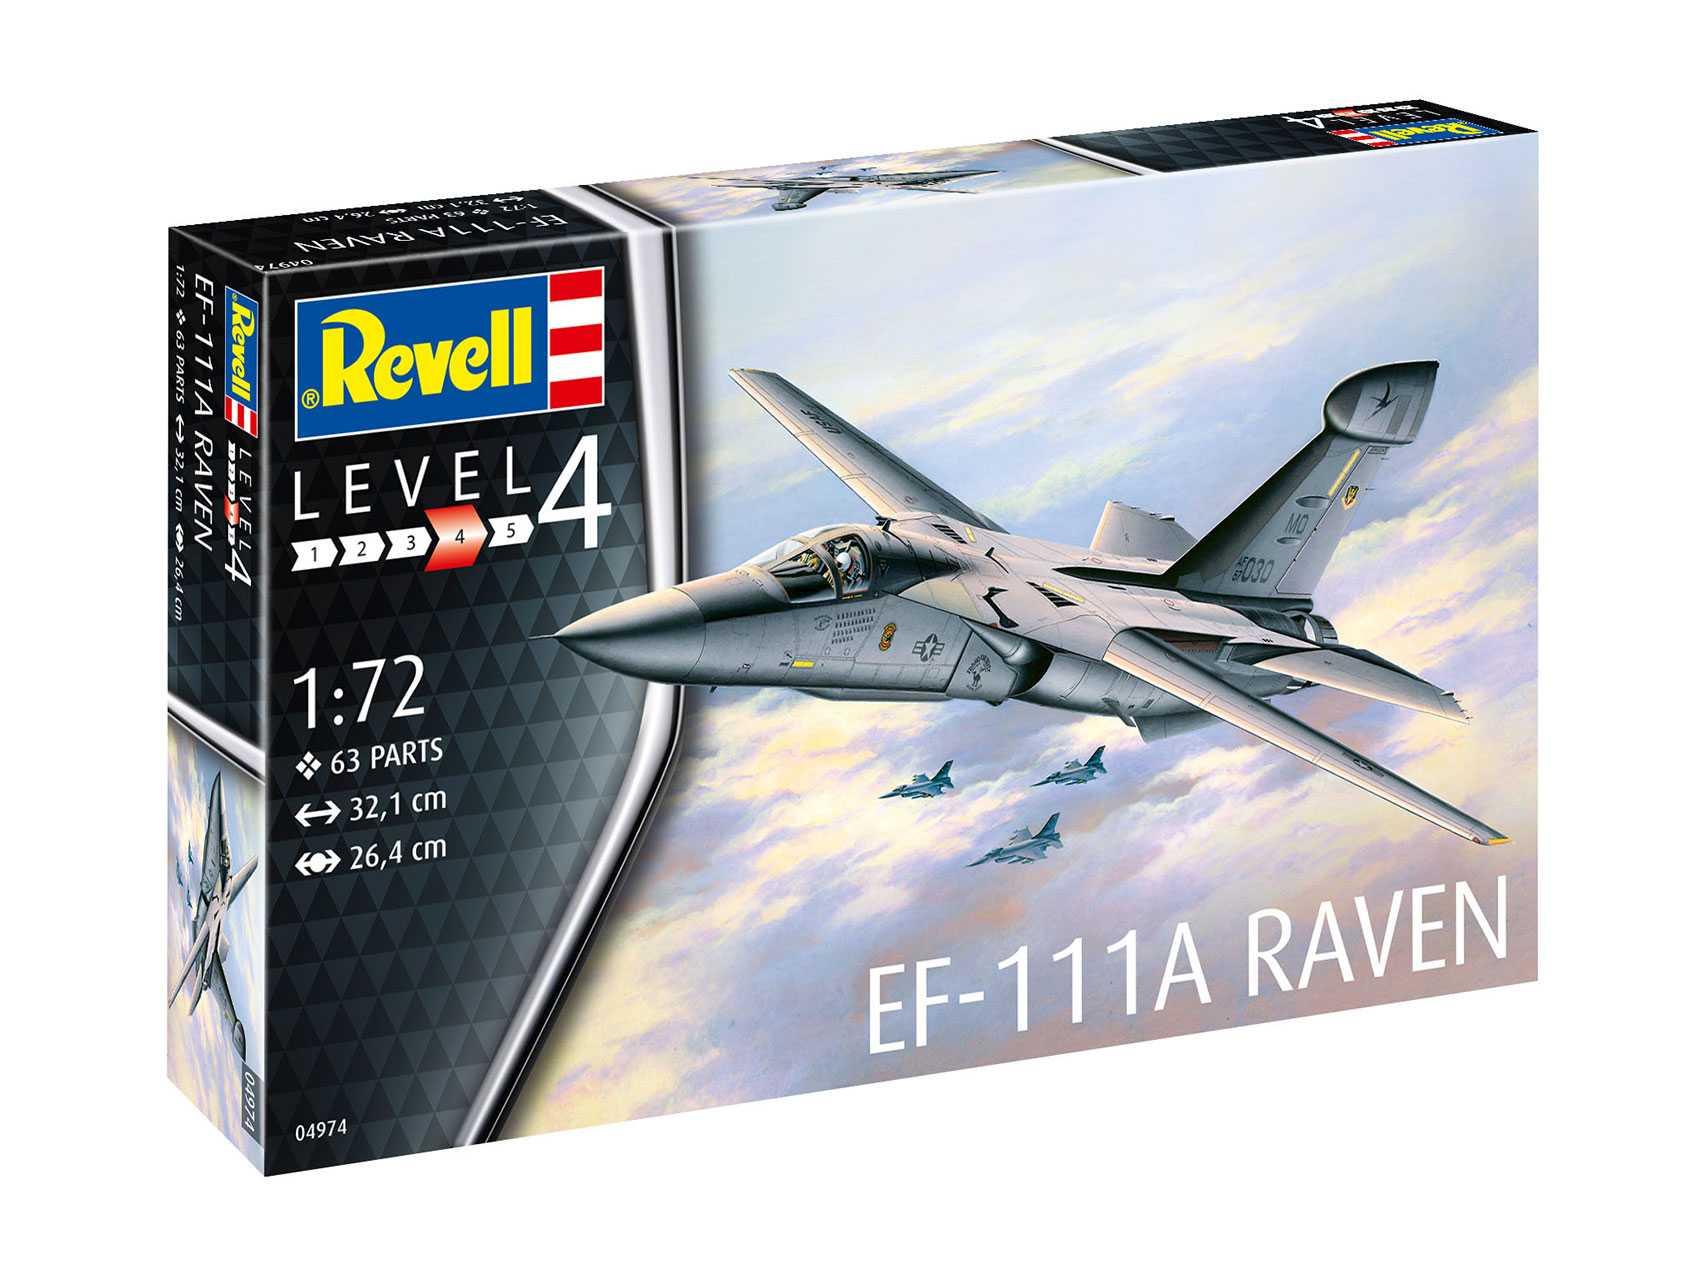 1:72 General Dynamics EF-111A Raven (Model Set)